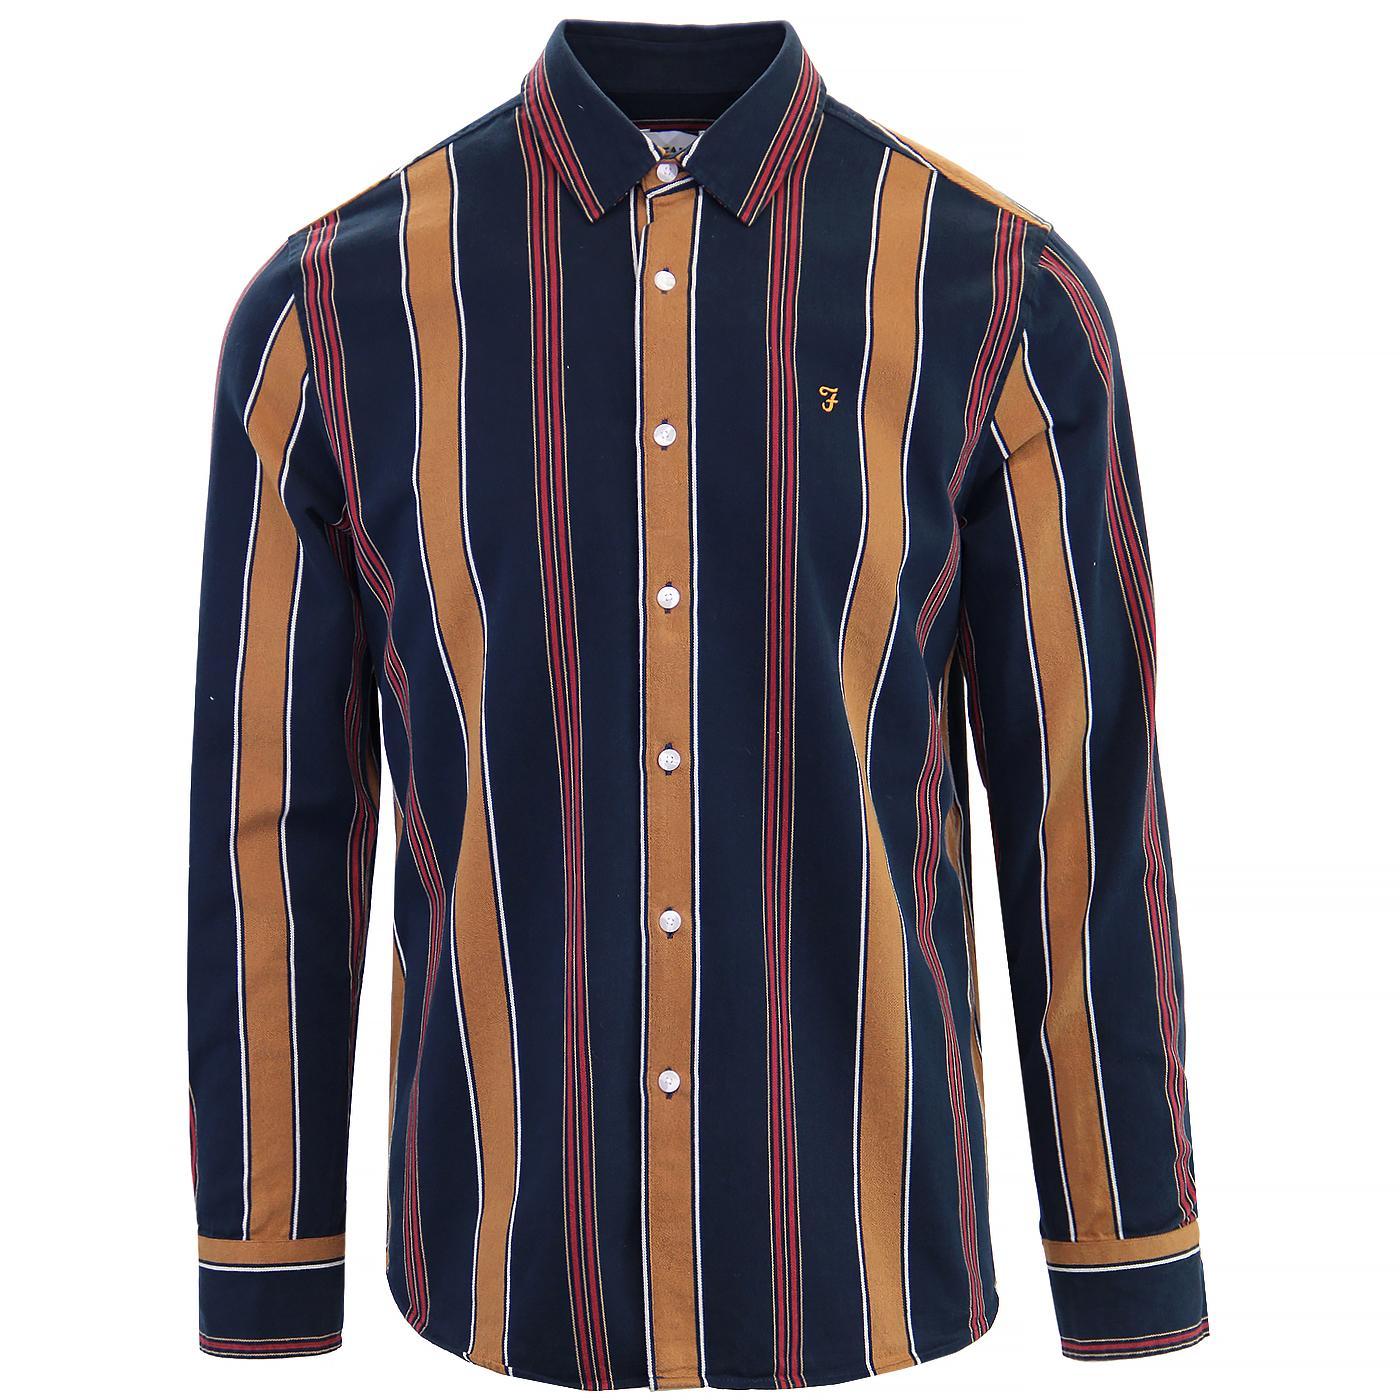 Laird FARAH Retro 60s Mod Bold Stripe Oxford Shirt